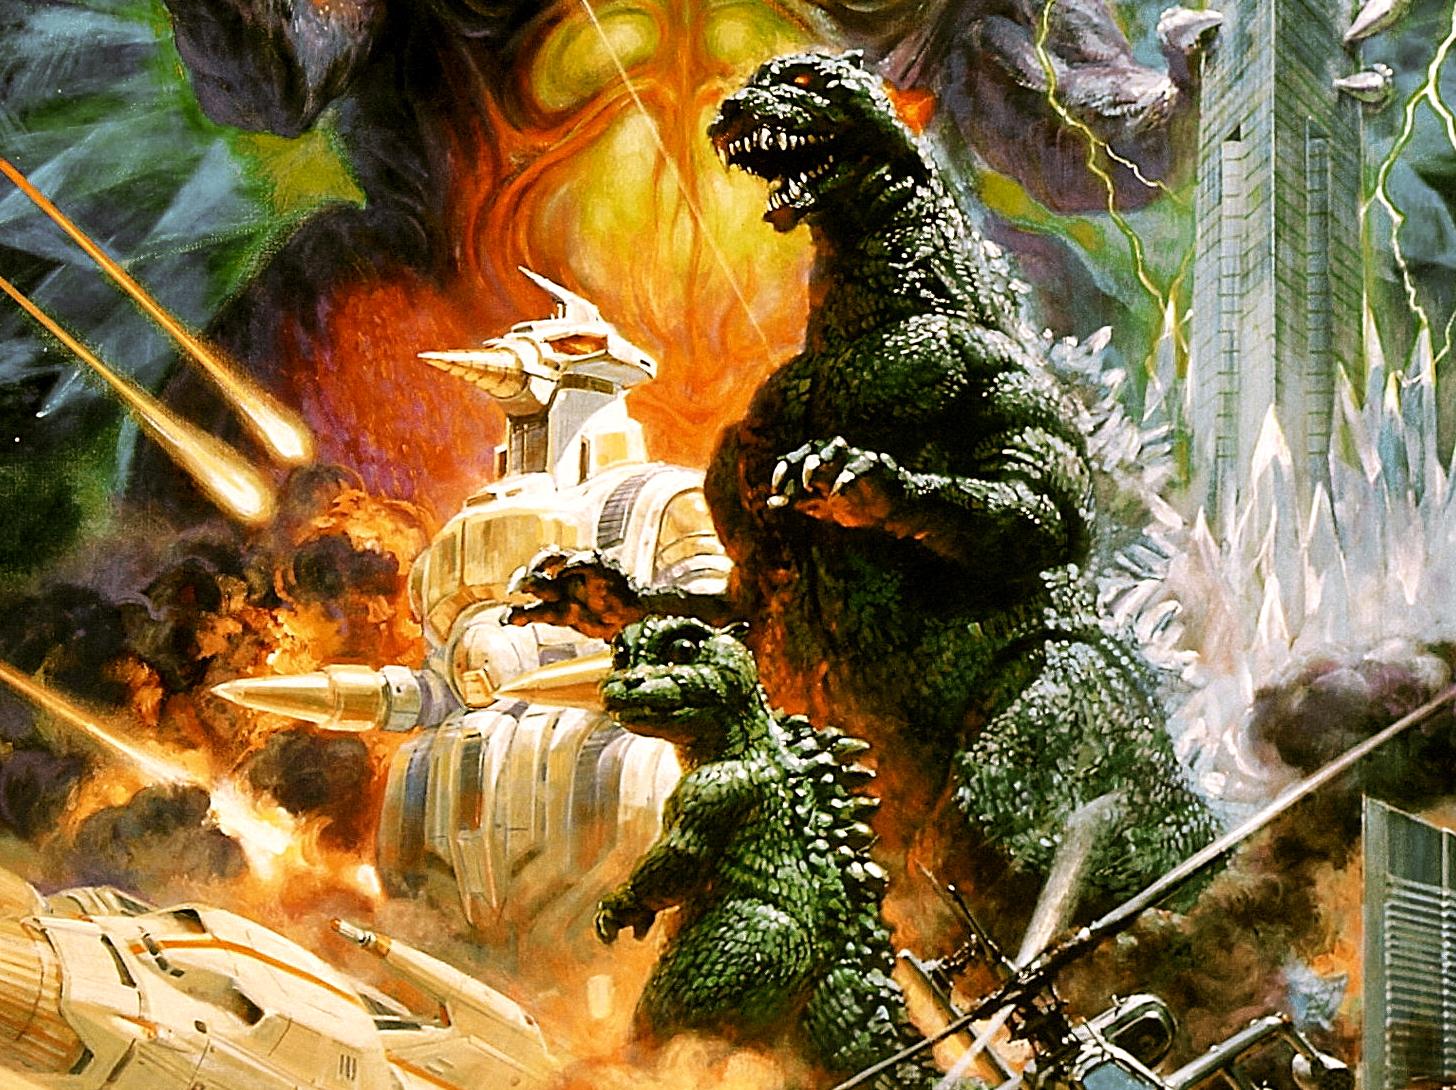 Godzilla Vs Space Godzilla Computer Wallpapers Desktop Backgrounds 1456x1090